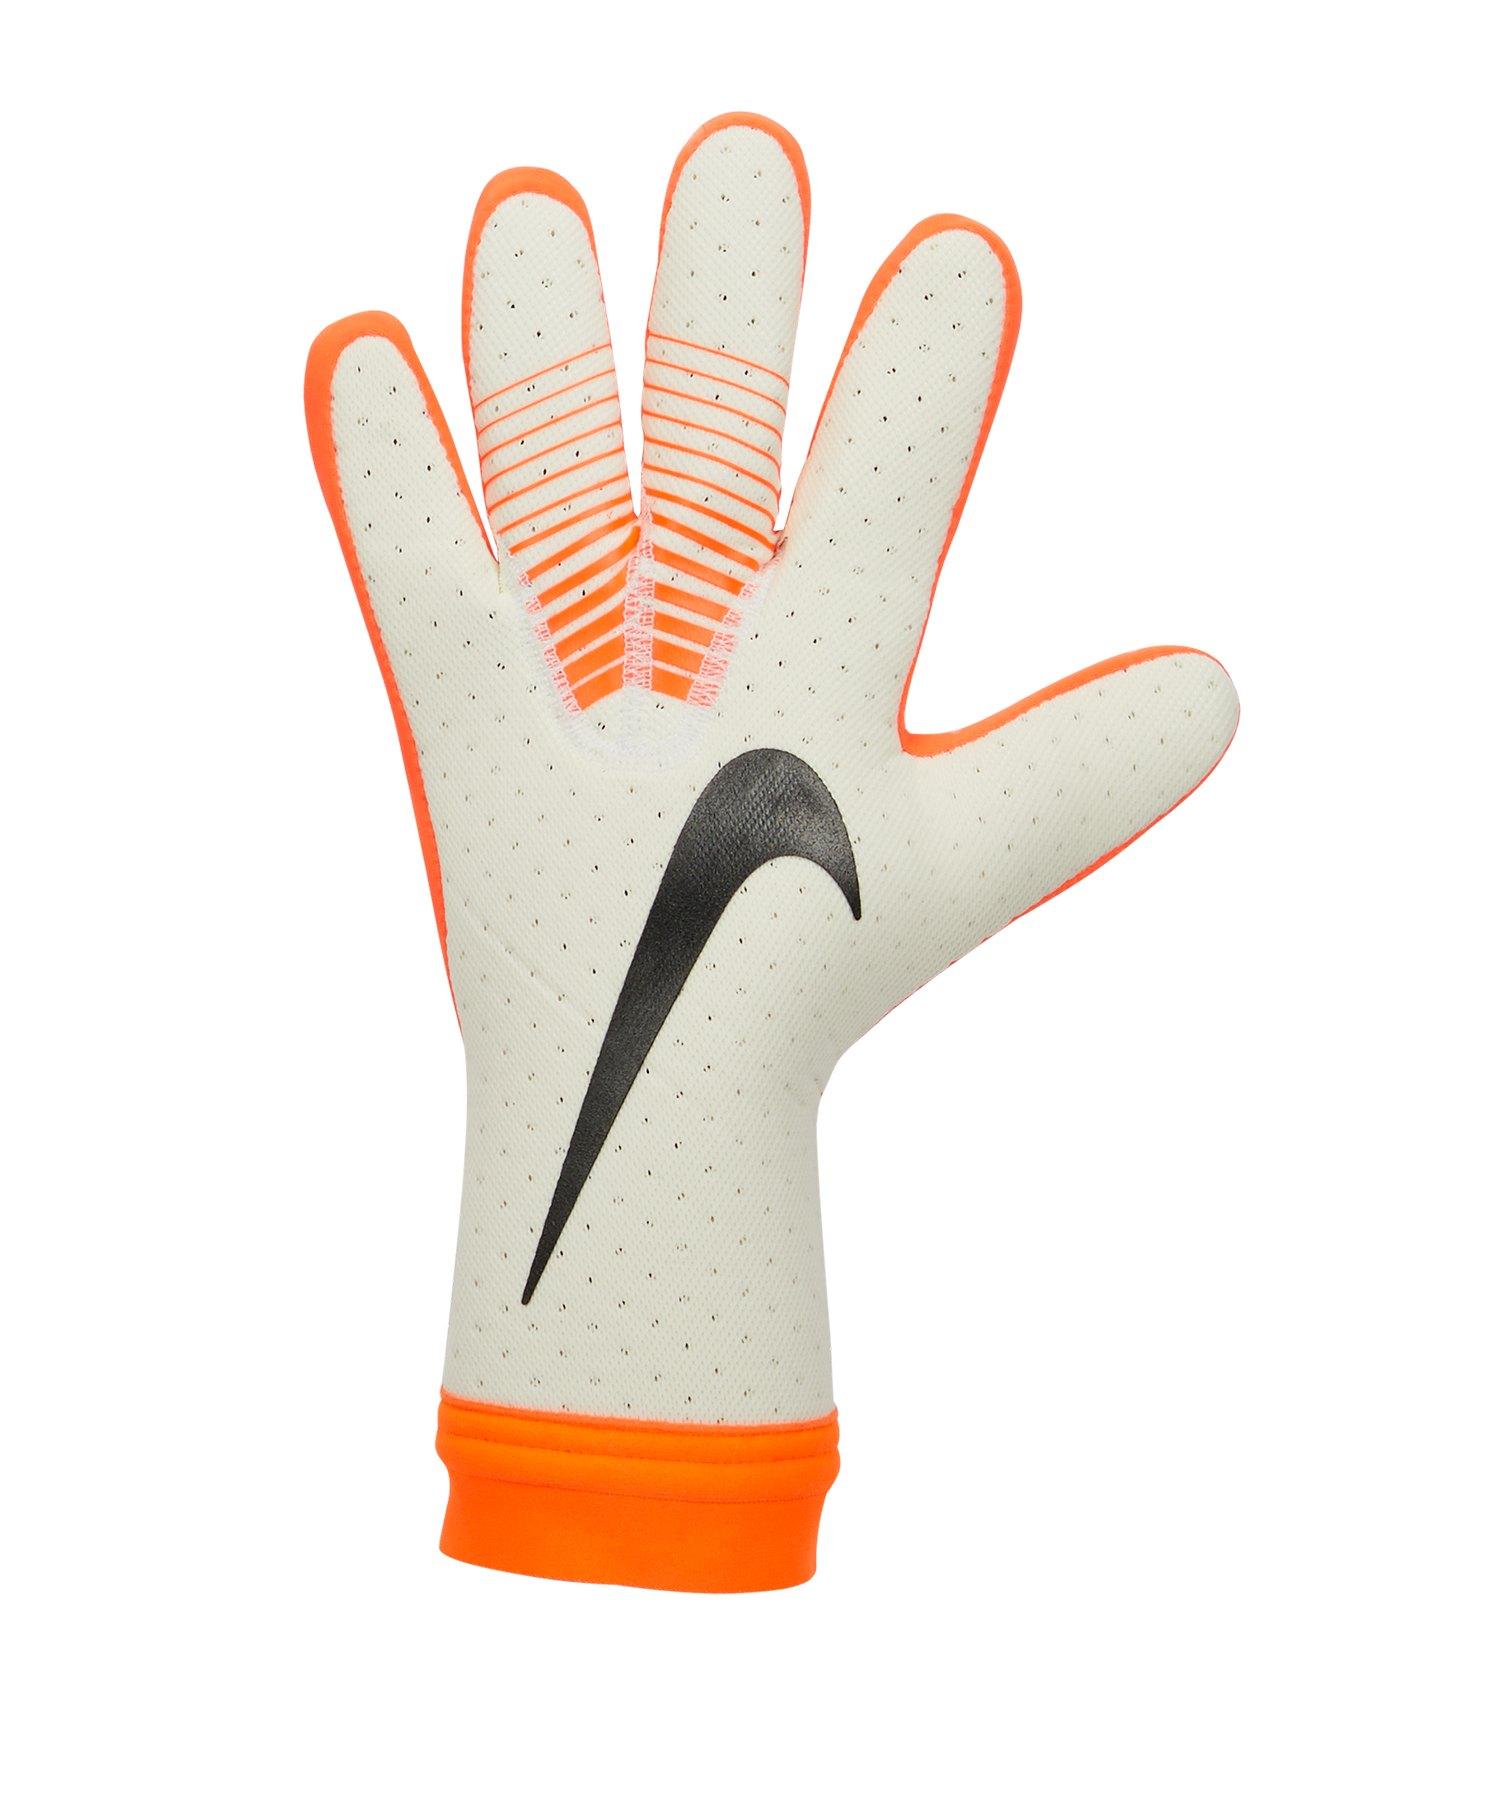 Nike Mercurial Touch Elite Torwarthandschuh F100 - Weiss